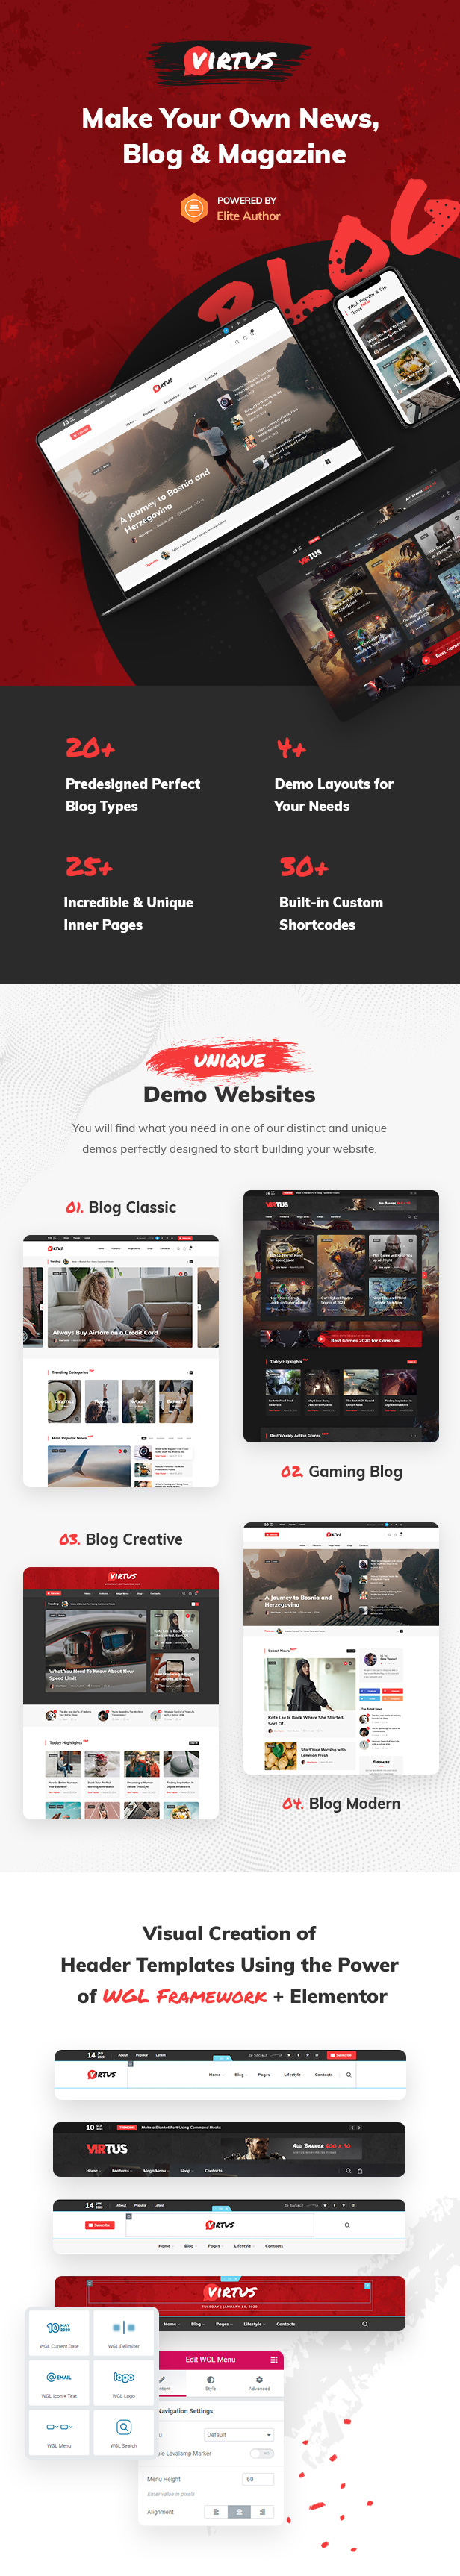 Virtus - Modern Blog & Magazine WordPress Theme - 1